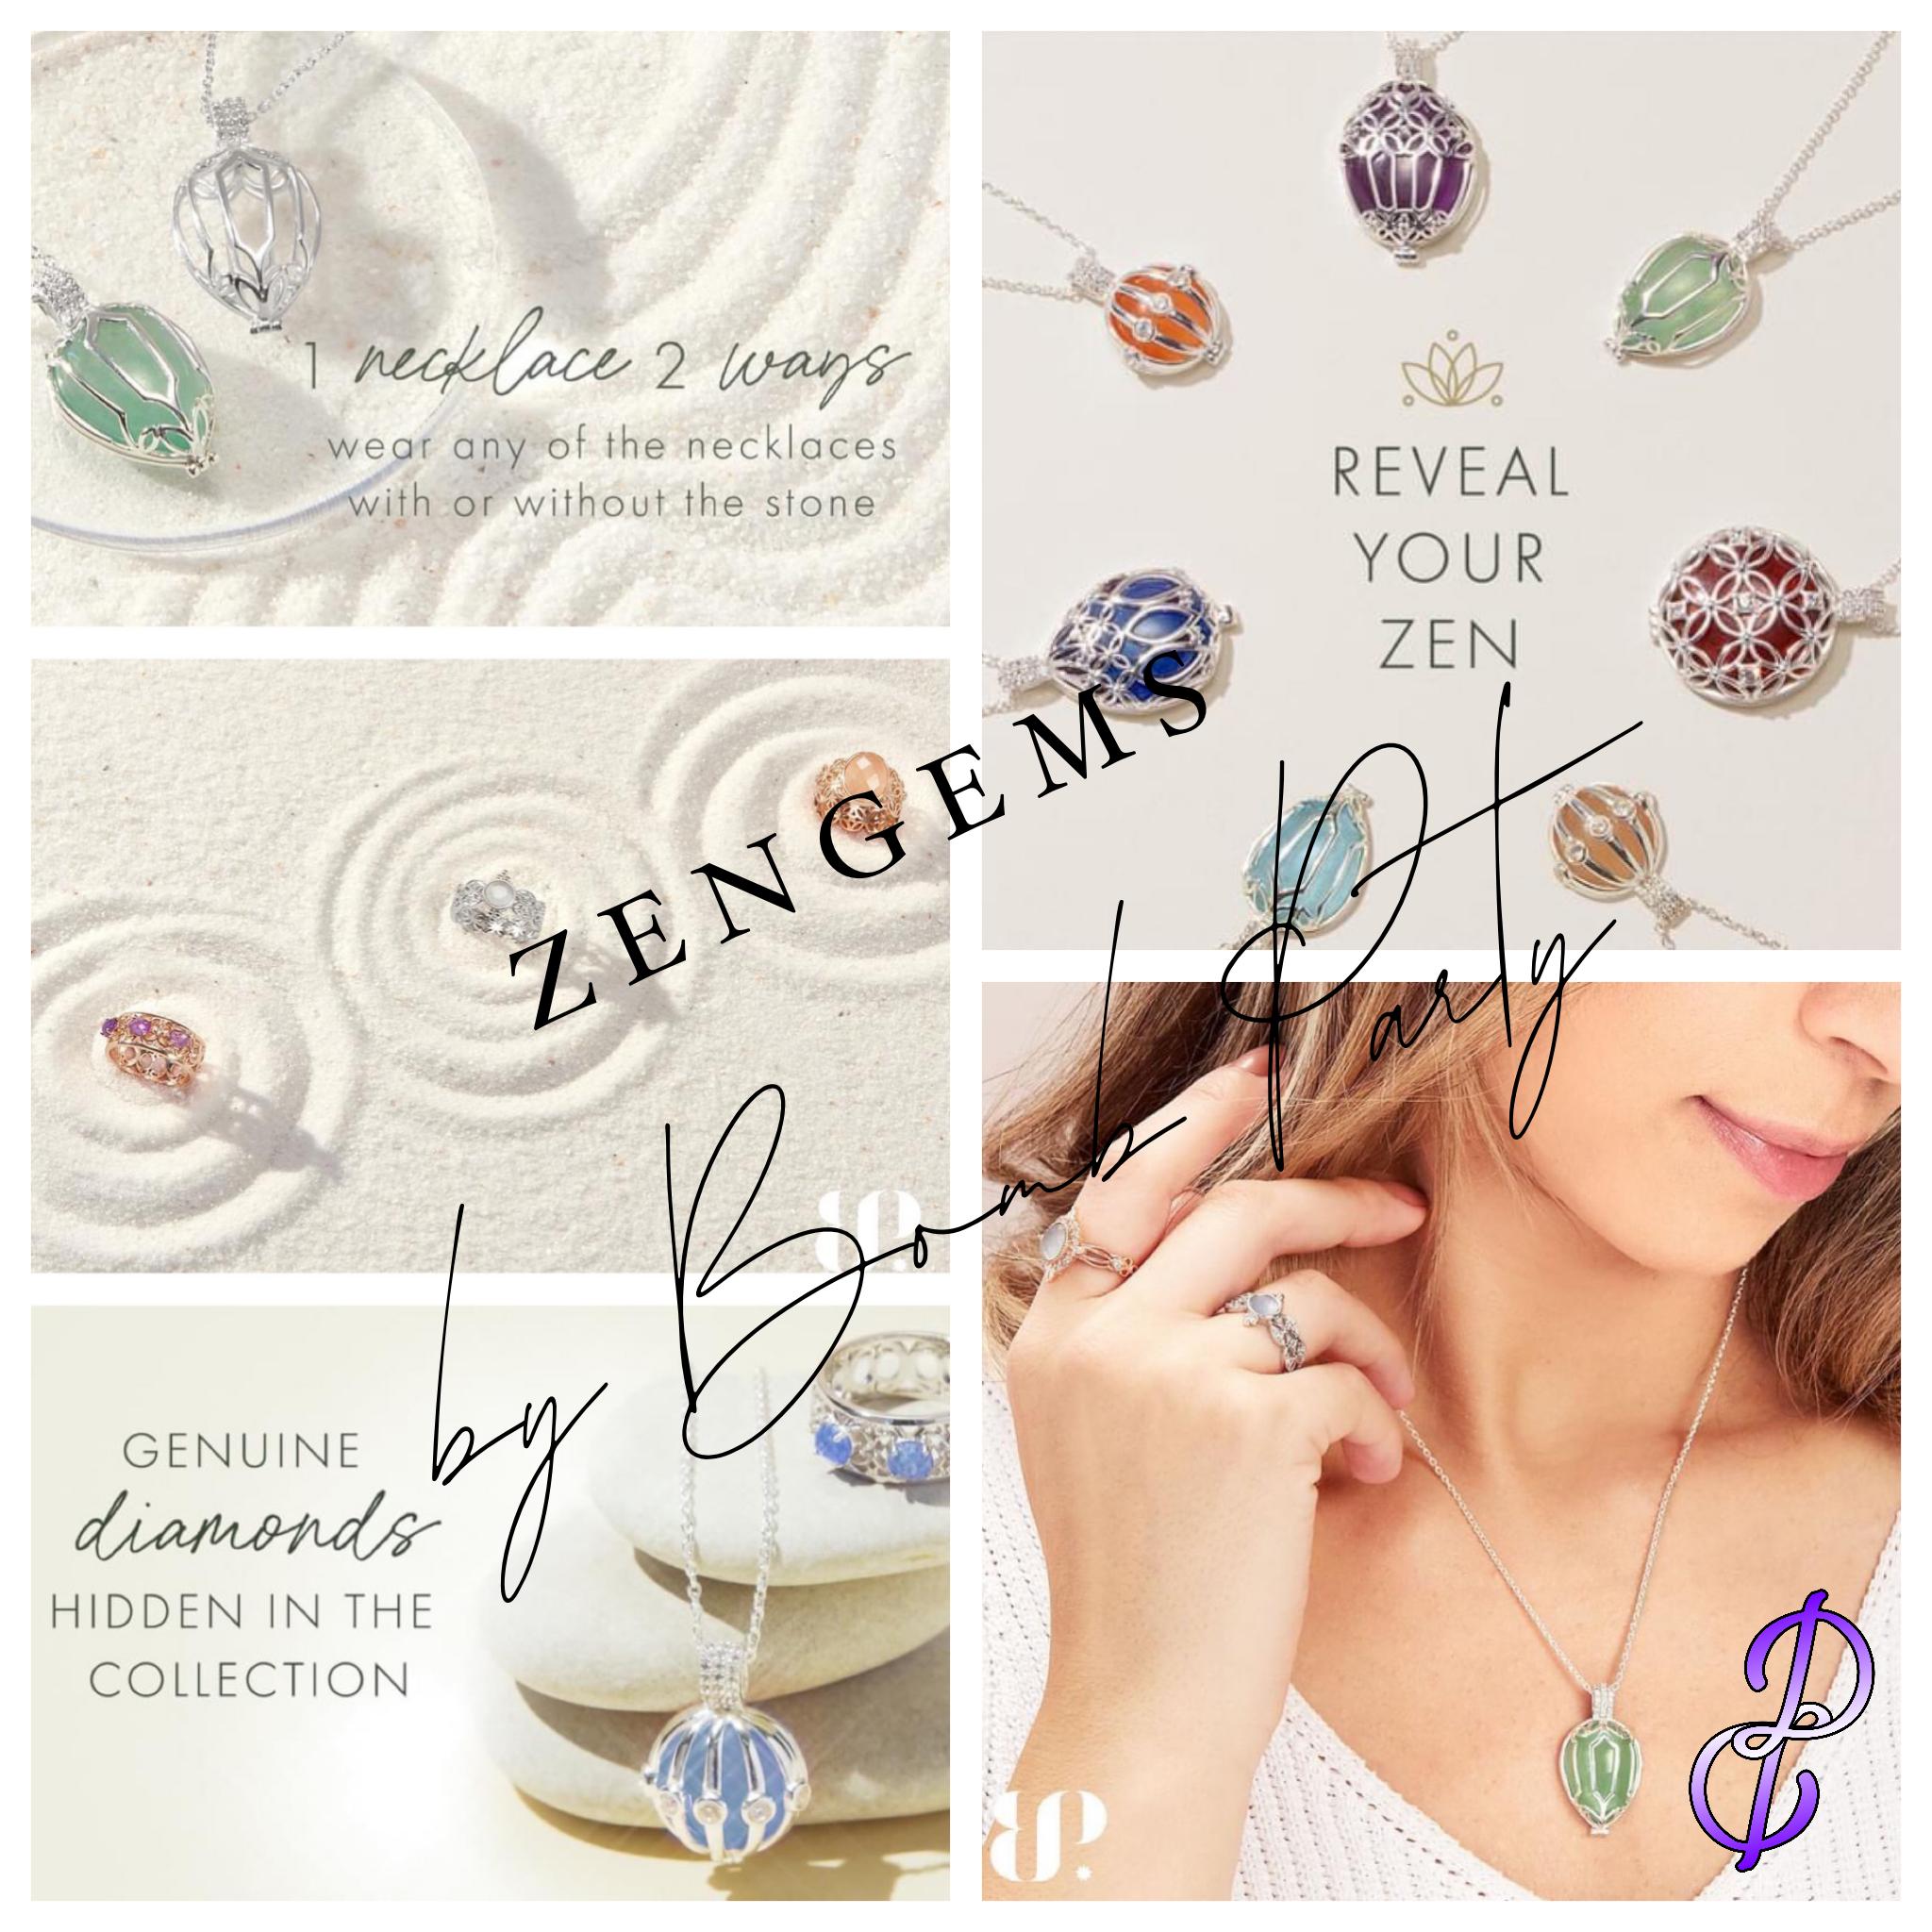 Zen Gems Necklace Pre Order Event